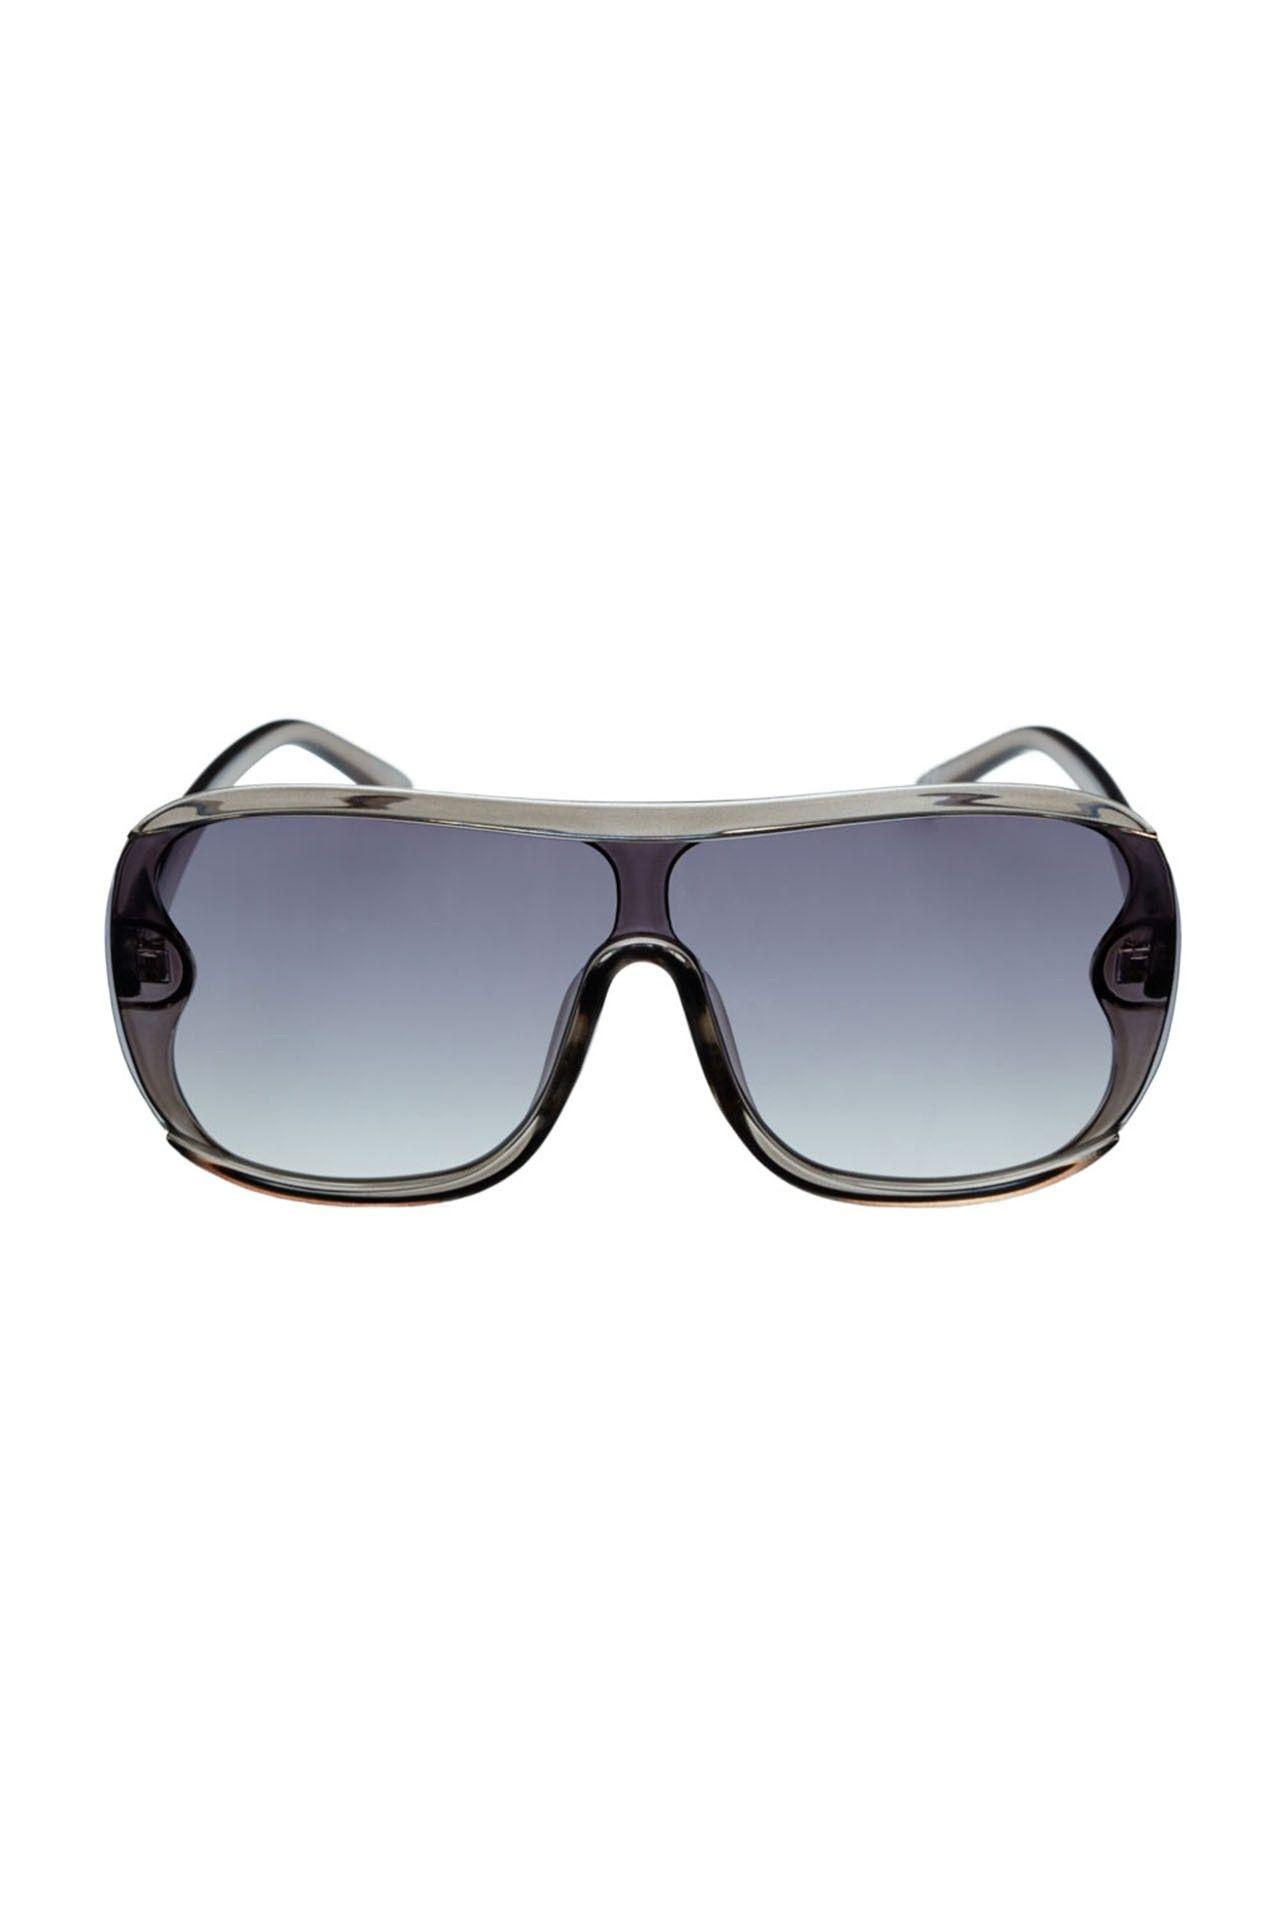 Afbeelding van Icon Eyewear Zonnebril 80117 Dark Clear Grey A